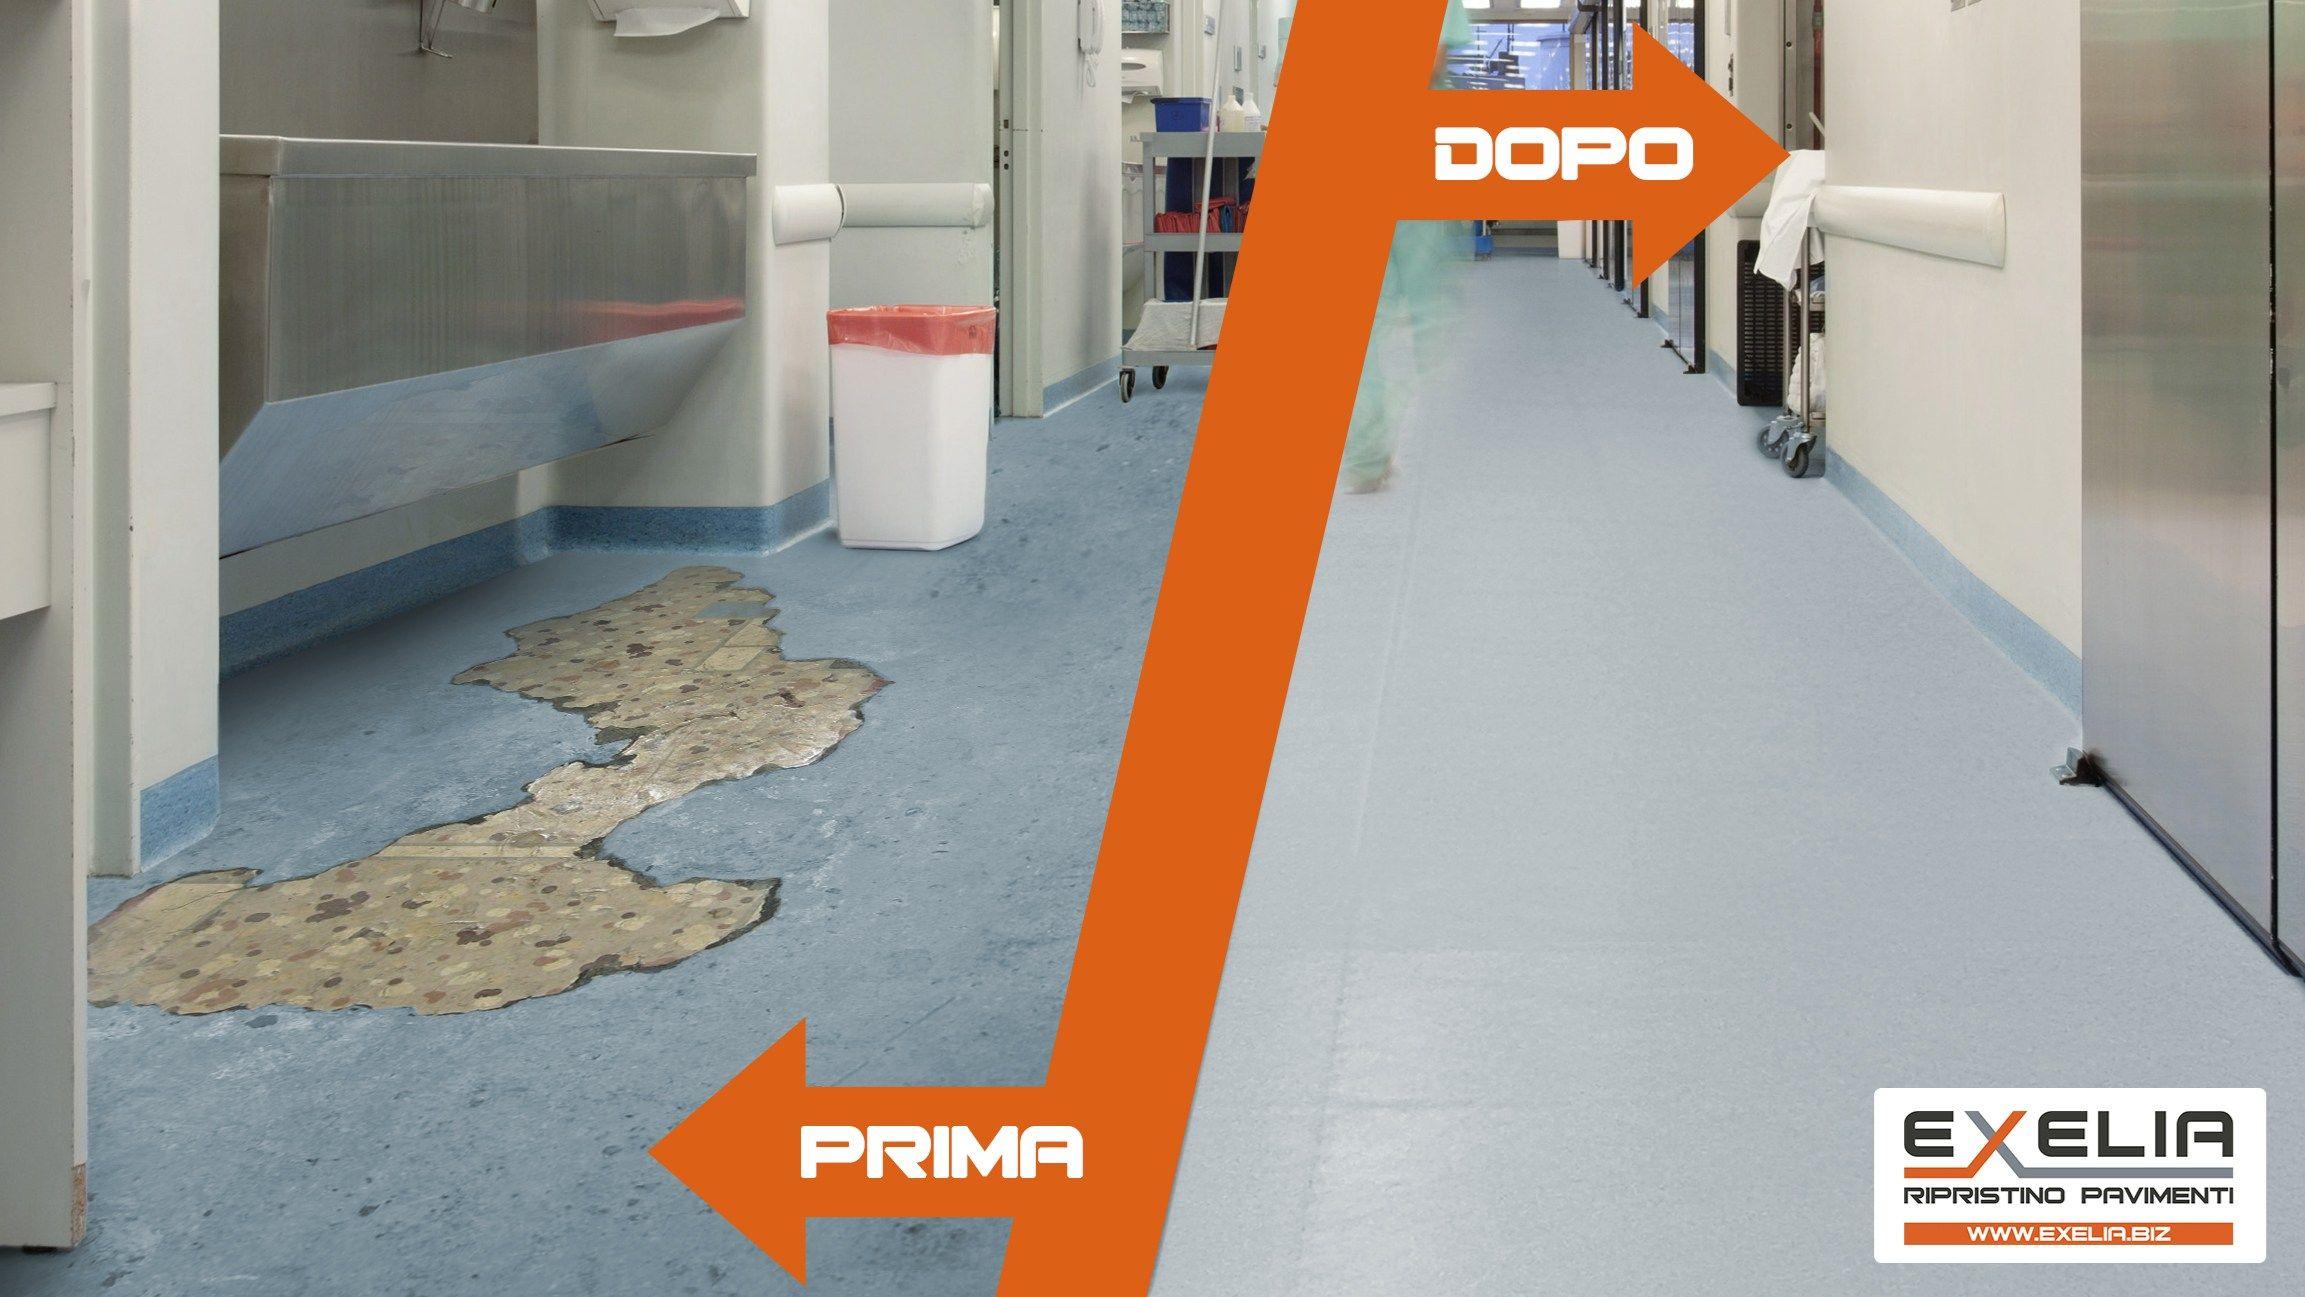 Ripristino pavimenti exelia by m p i - Piastrelle garage prezzi ...